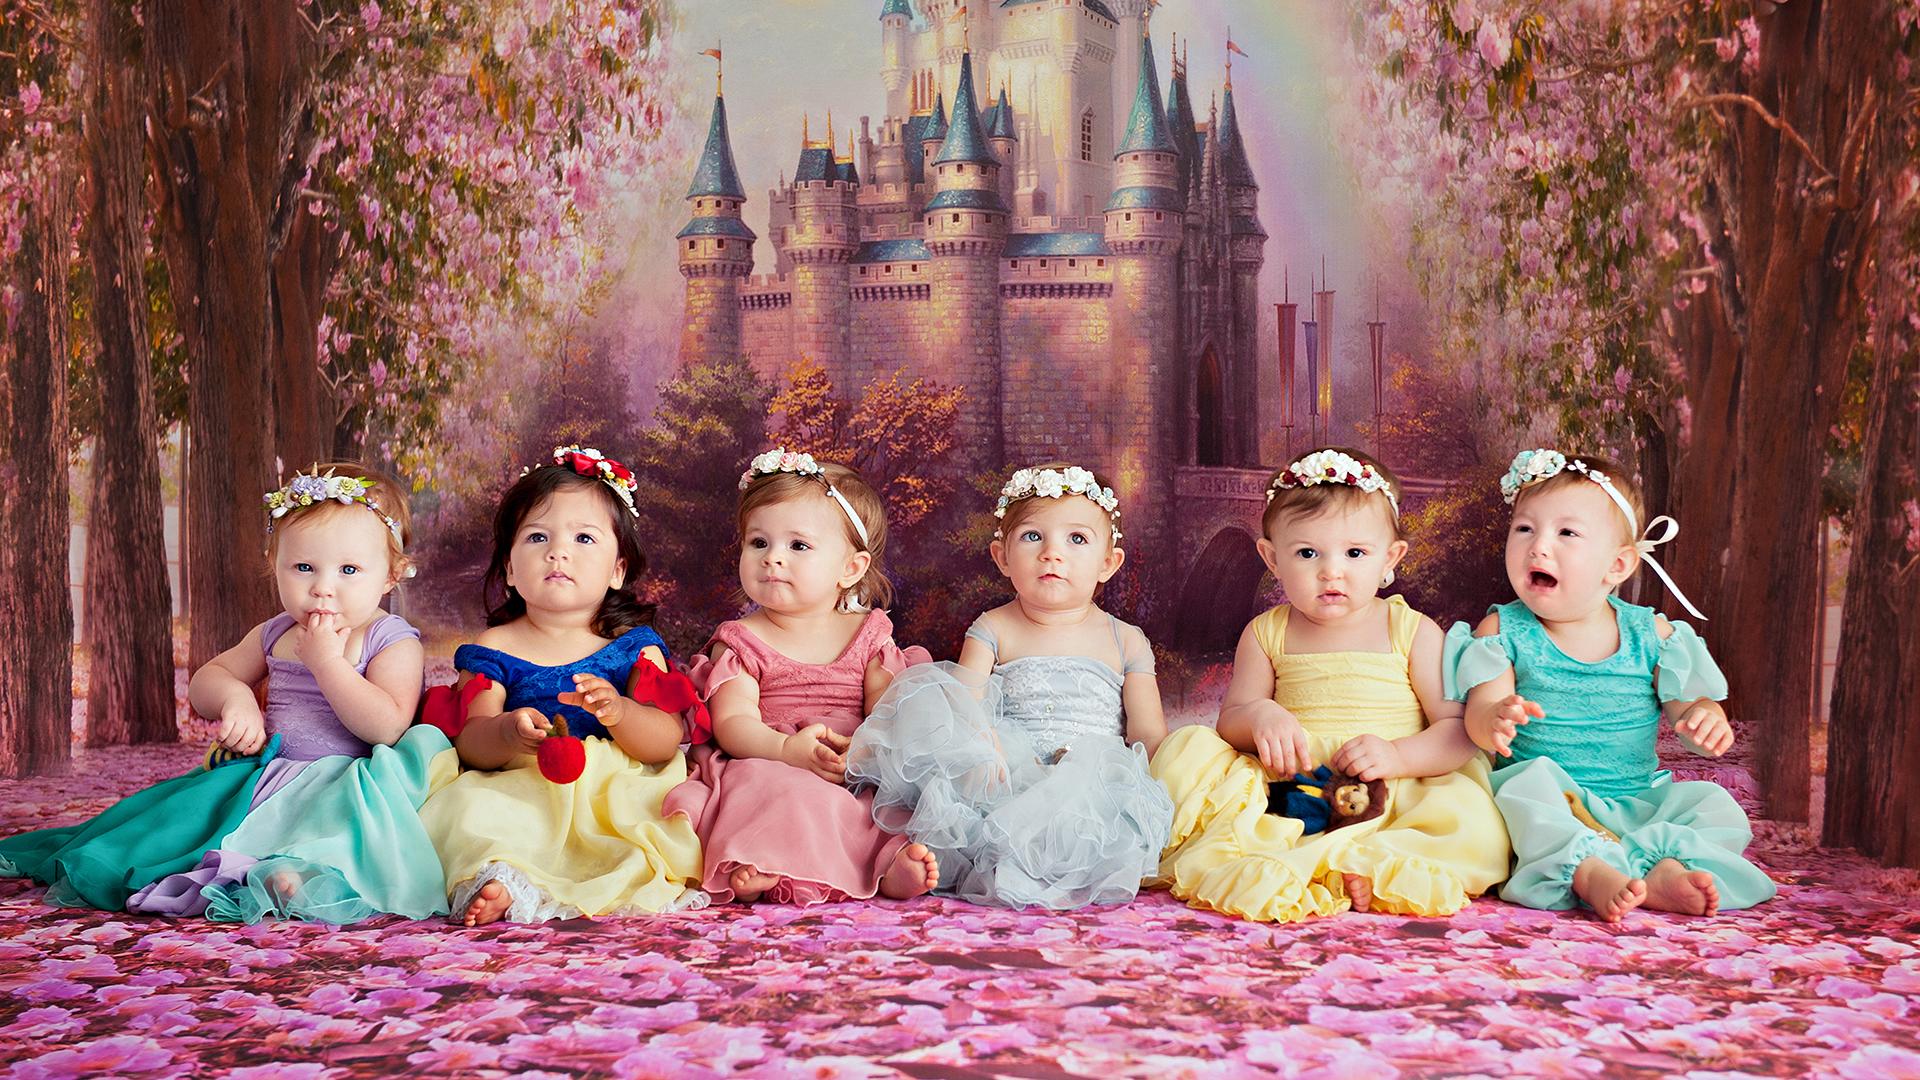 princesas disney baby | Idéias criativas | Pinterest ...  |Baby Disney Princess